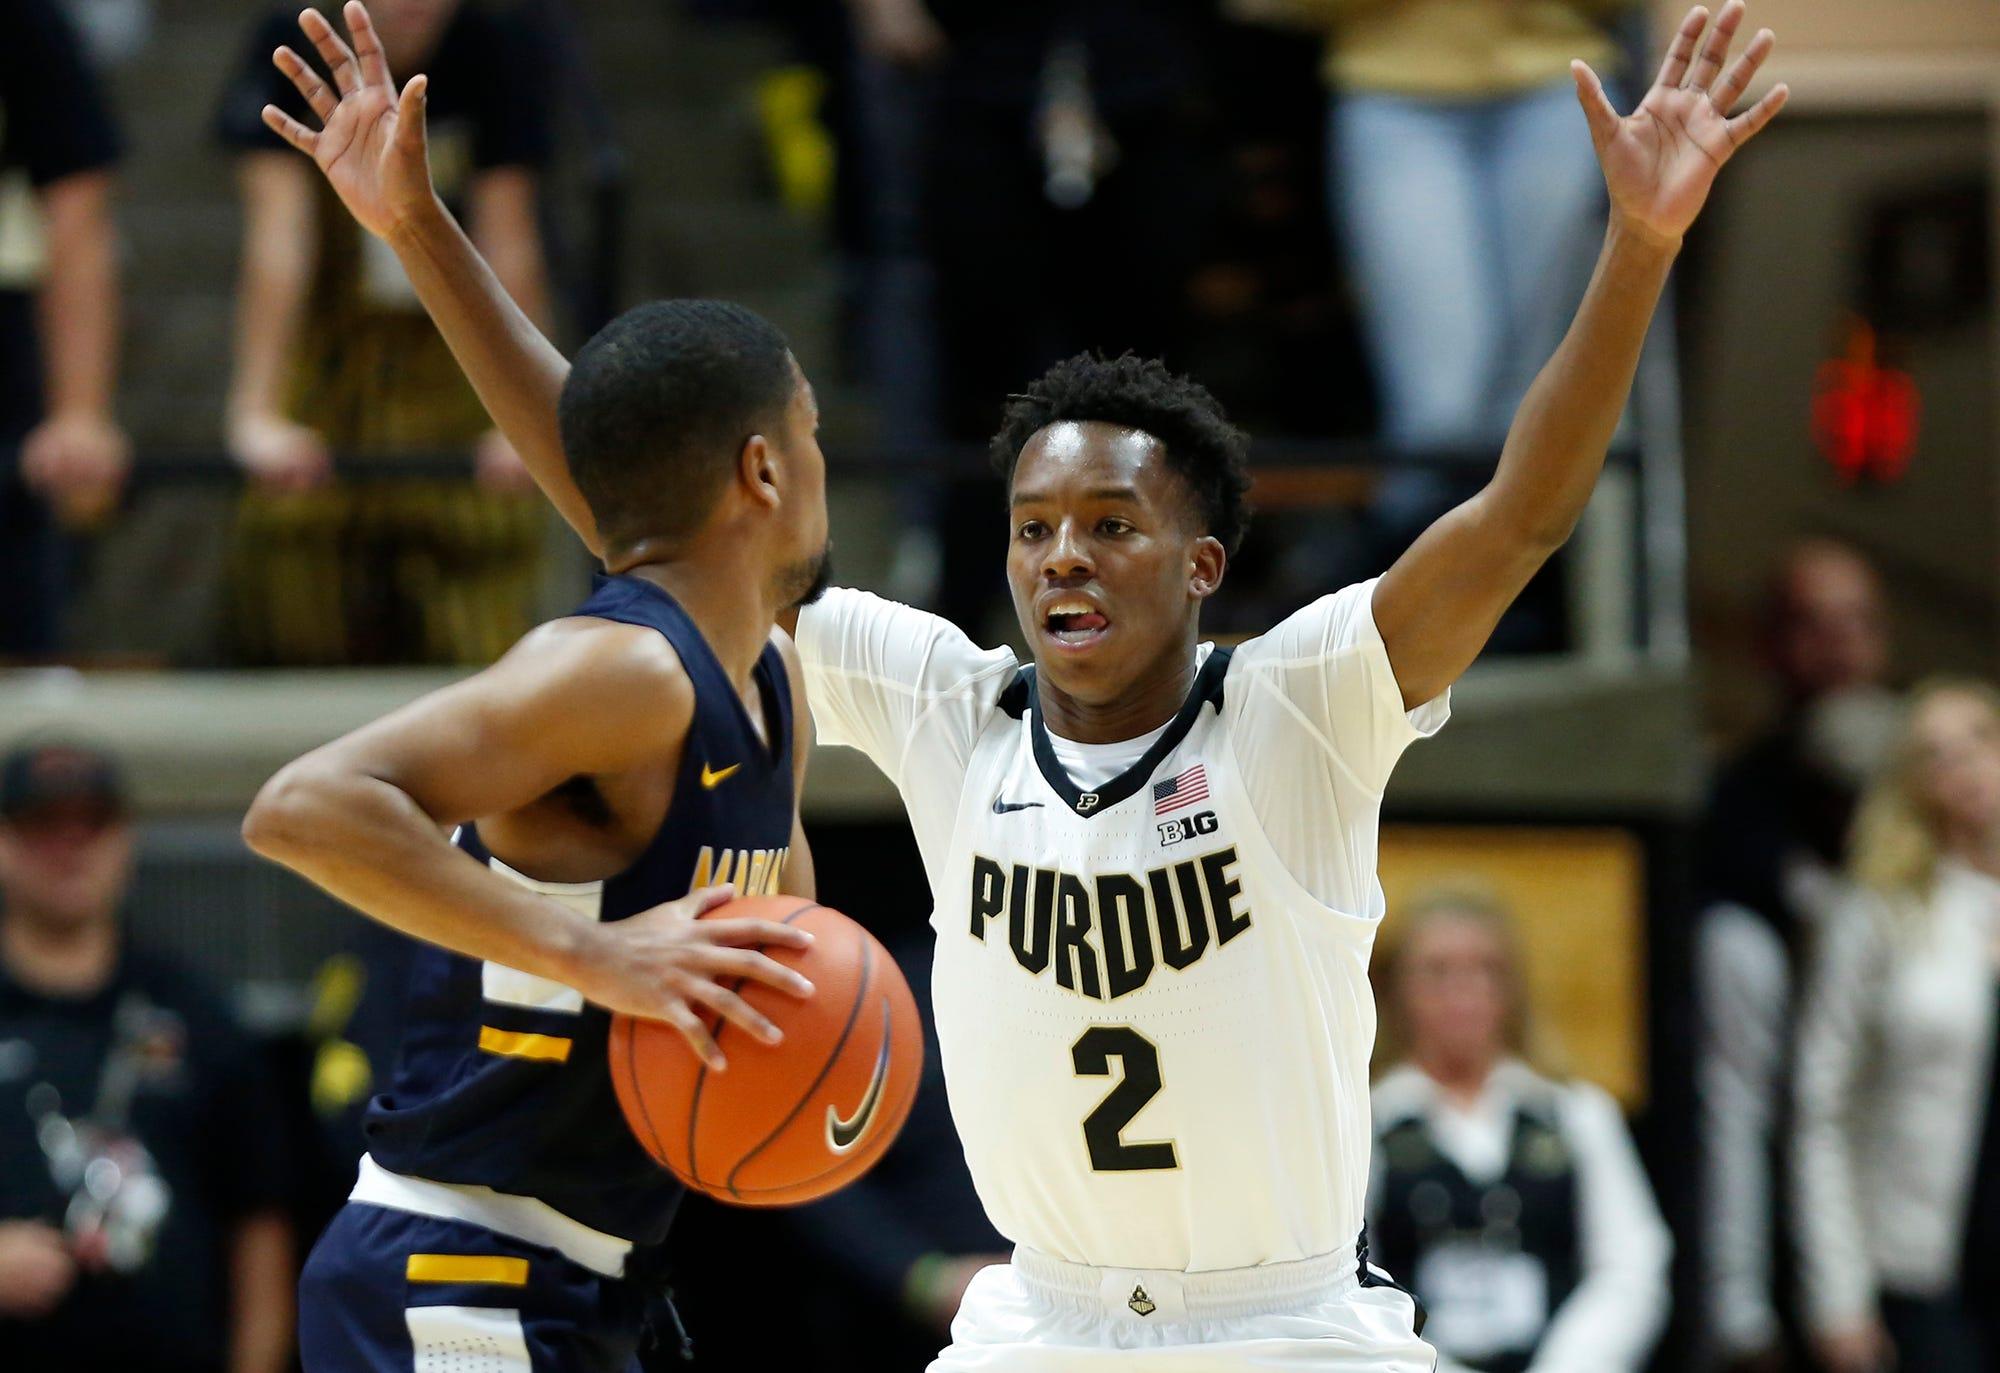 Eric Hunter Jr. of Purdue marks Wes Stowers of Marian University Thursday, November 1, 2018, at Mackey Arena. Purdue defeated Marian University 75-56.